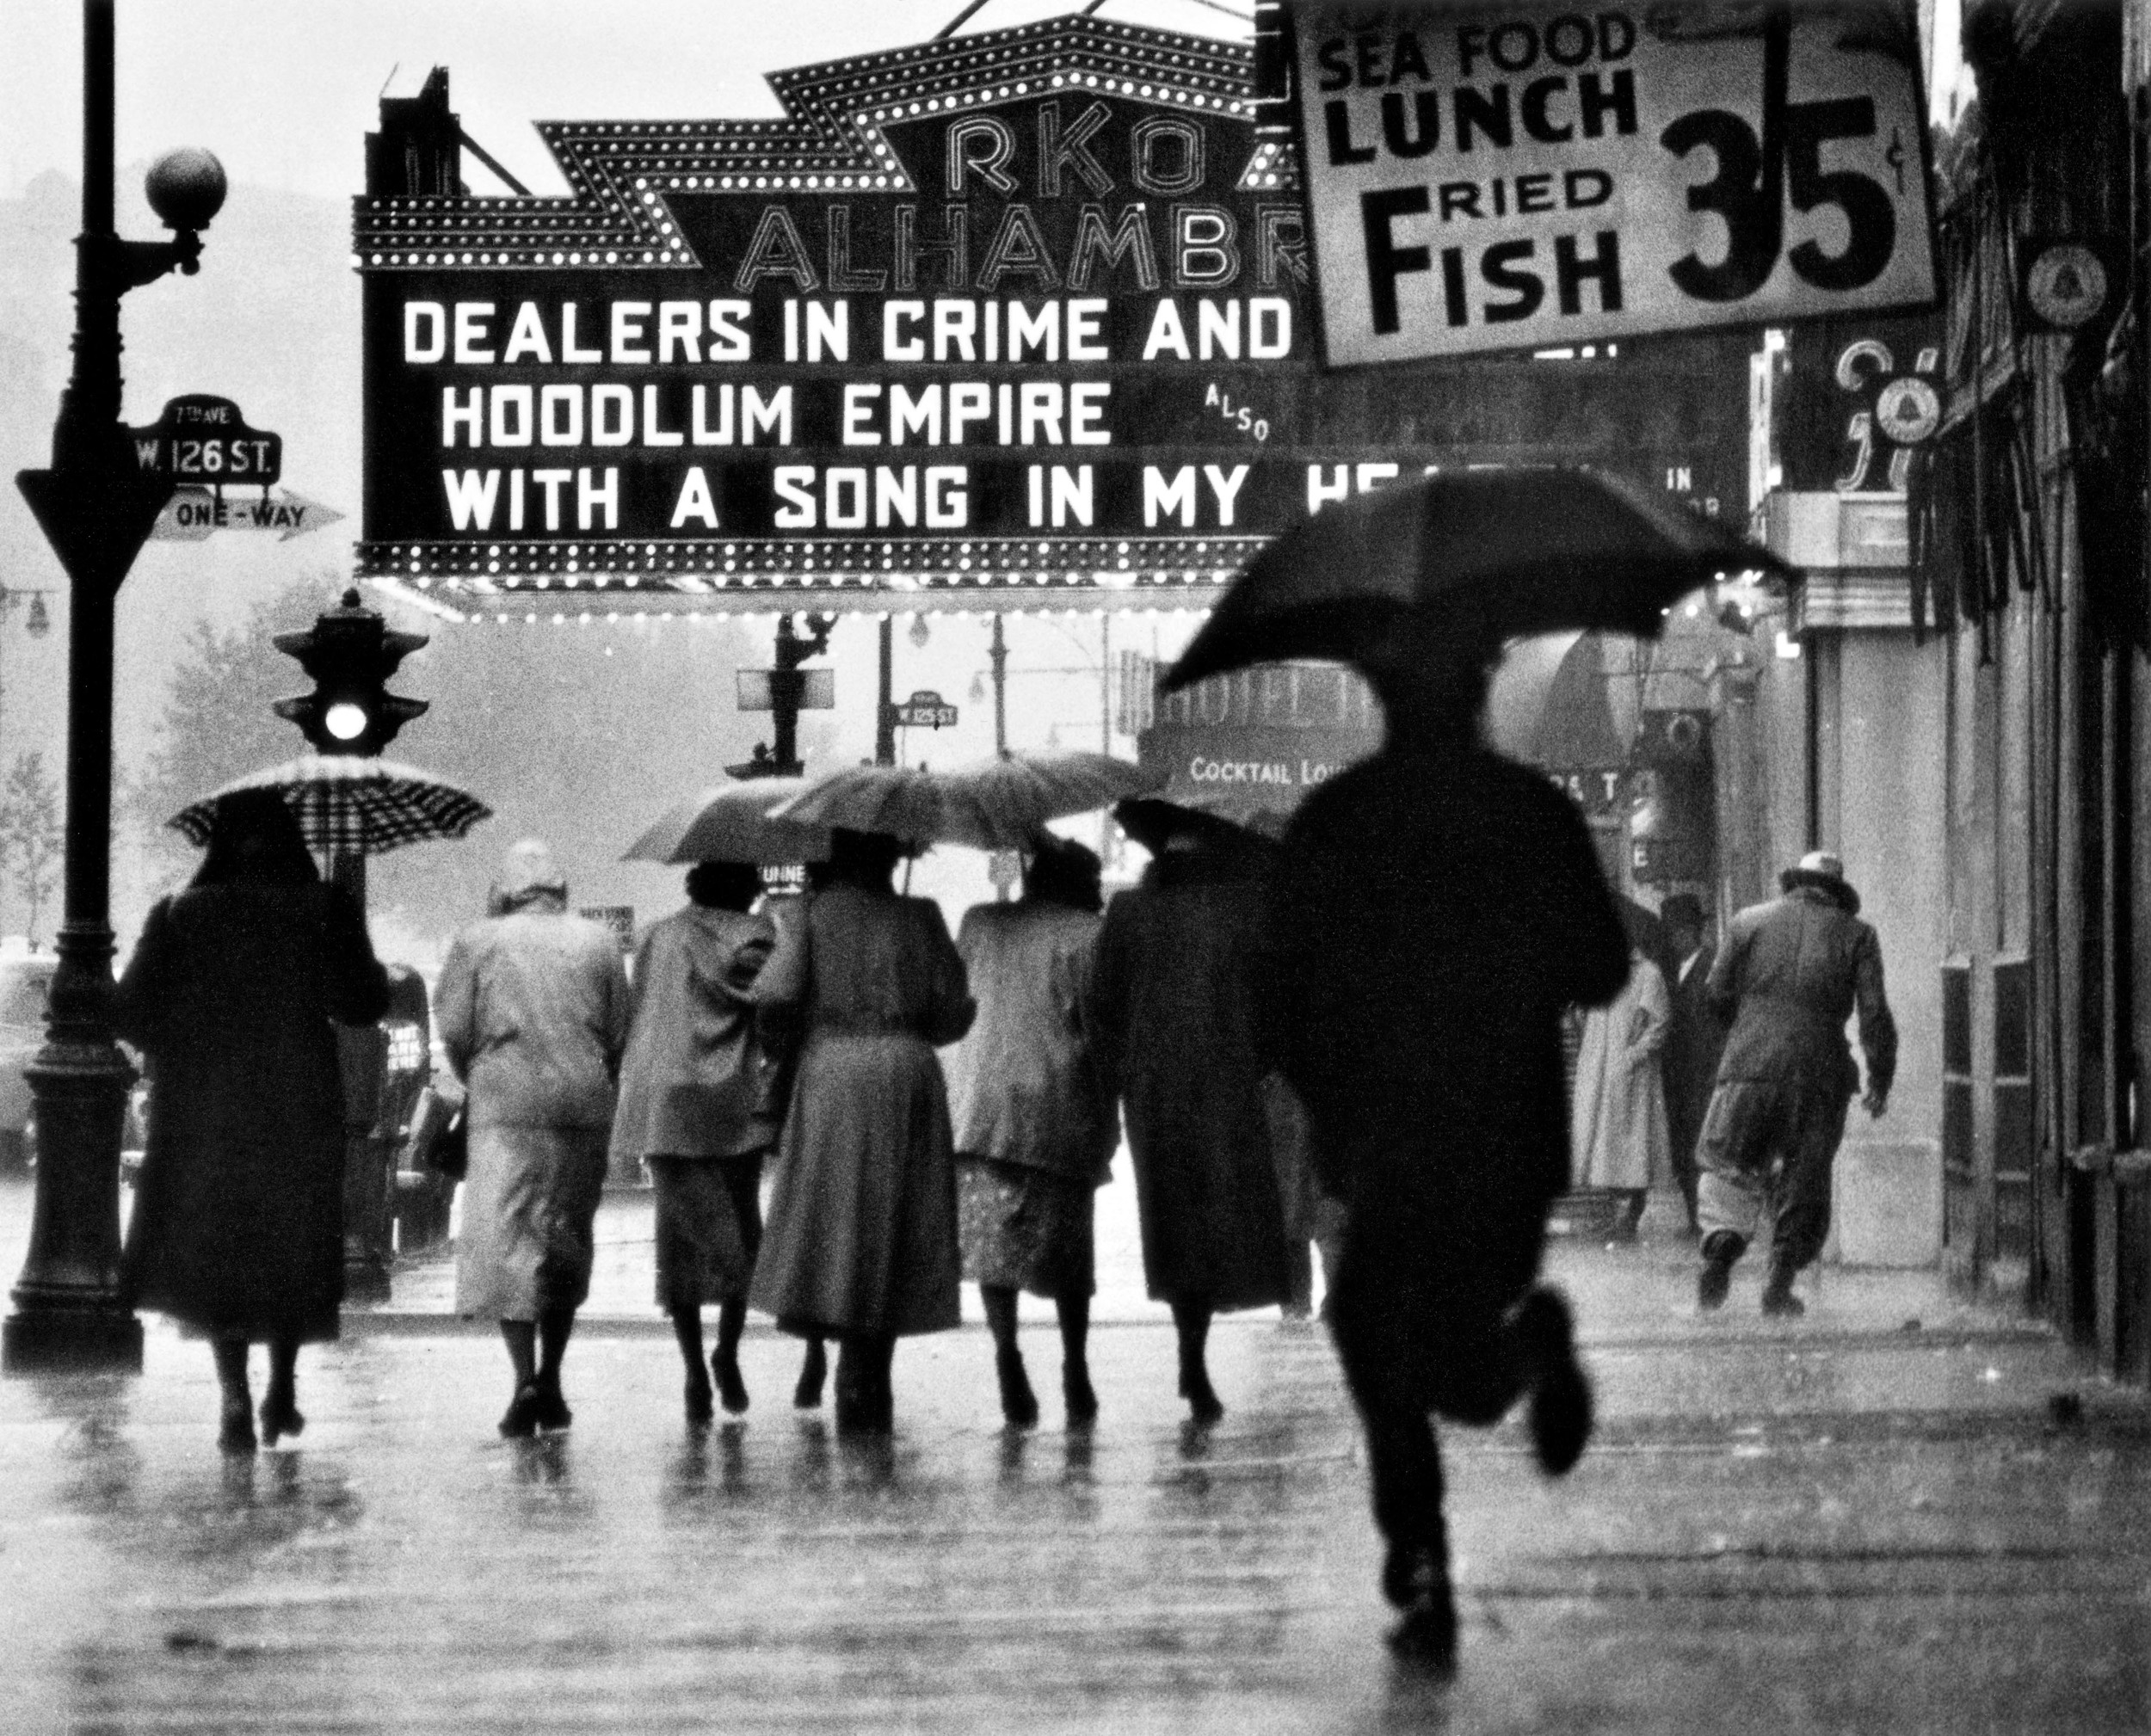 Image Above: ©The Gordon Parks Foundation. Gordon Parks, 'Harlem Neighborhood, Harlem,' New York, 1952 / Courtesy of The Gordon Parks Foundation/The Art Institute of Chicago/Steidl